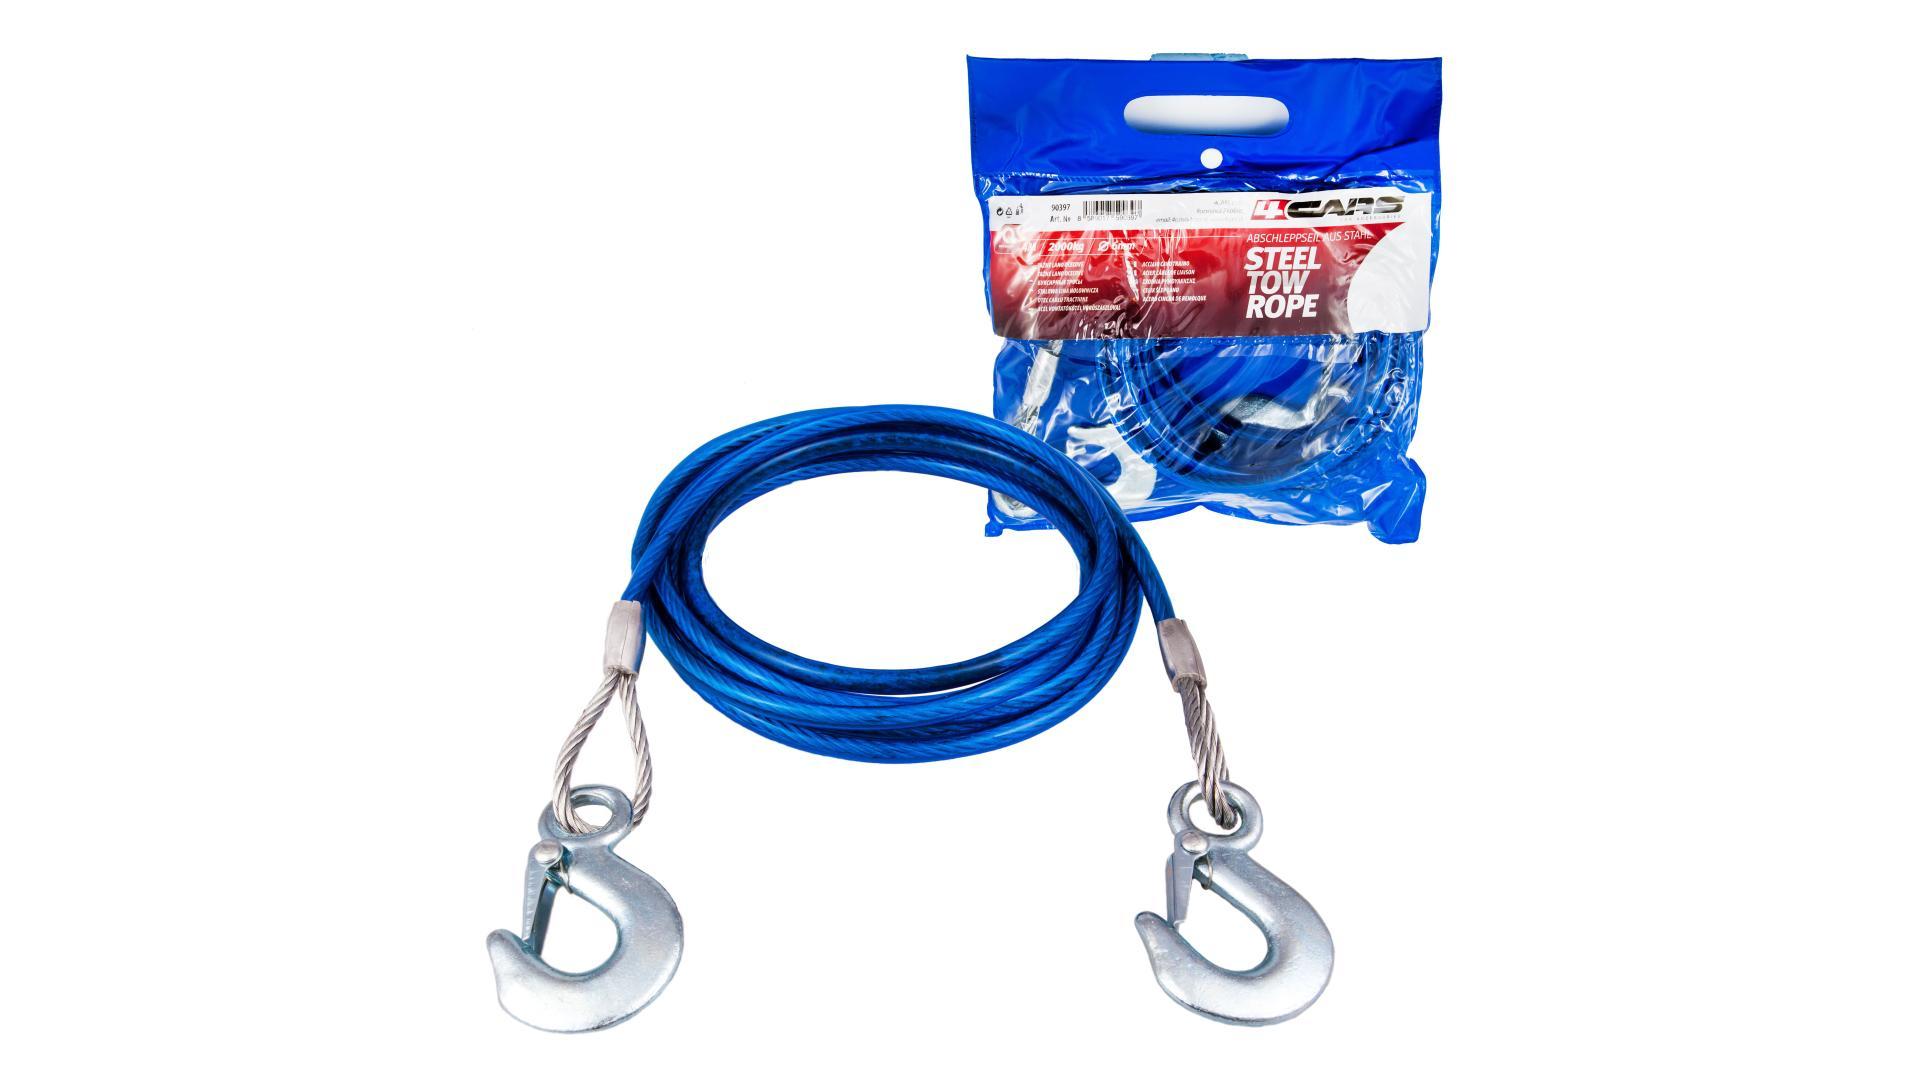 4CARS Tažné lano ocelové 2t, 4m, 6mm